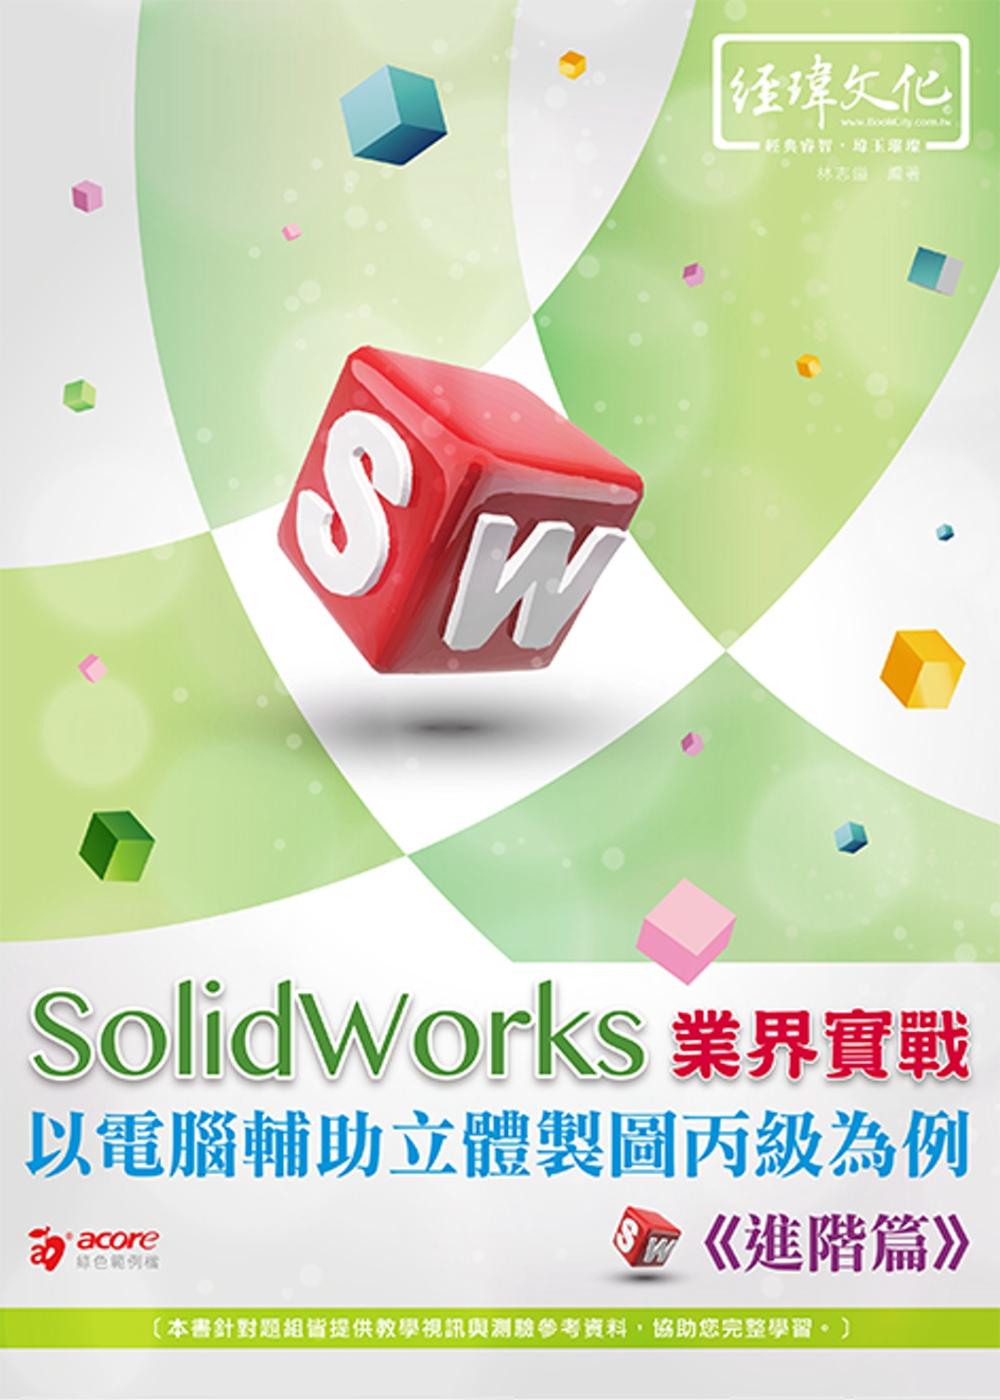 SolidWorks 業界實戰以電腦輔助立體製圖丙級為例:進階篇(附綠色範例檔+線上影片回函索取)